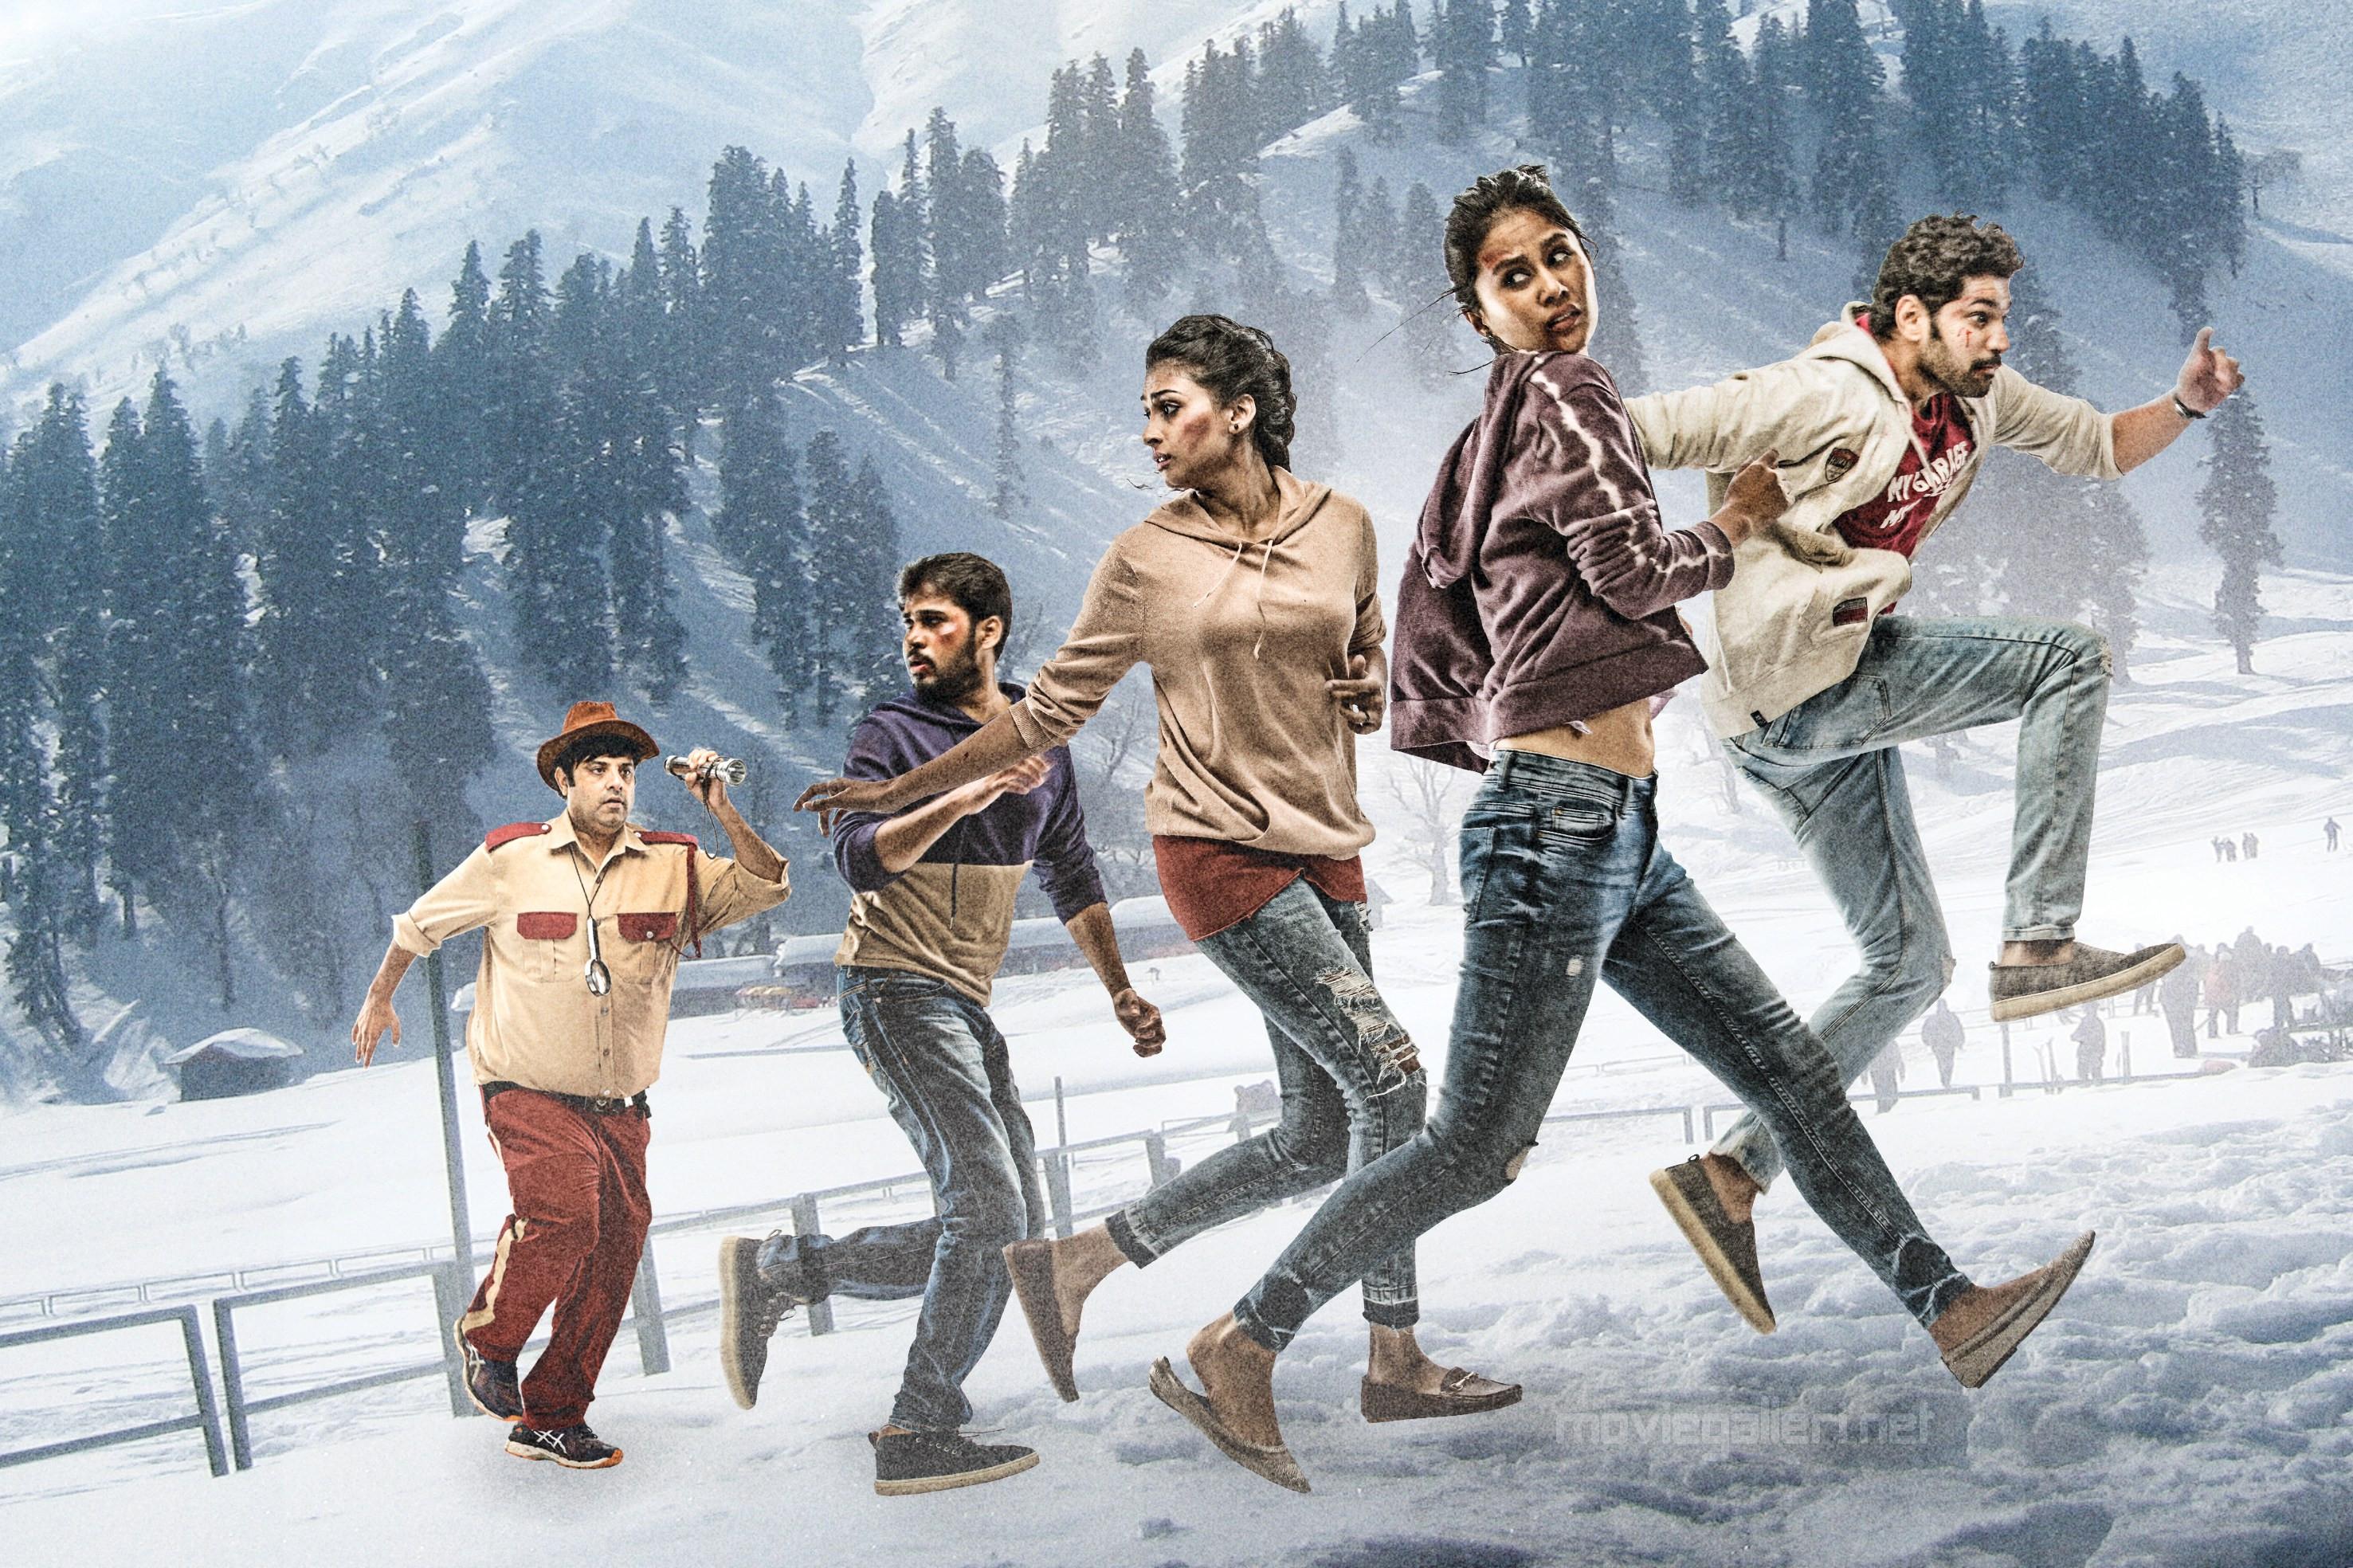 Krishnudu, Parvateesam, Karthik Raju, Sasha Chettri, Nithya Naresh in Operation Gold Fish Movie Pics HD